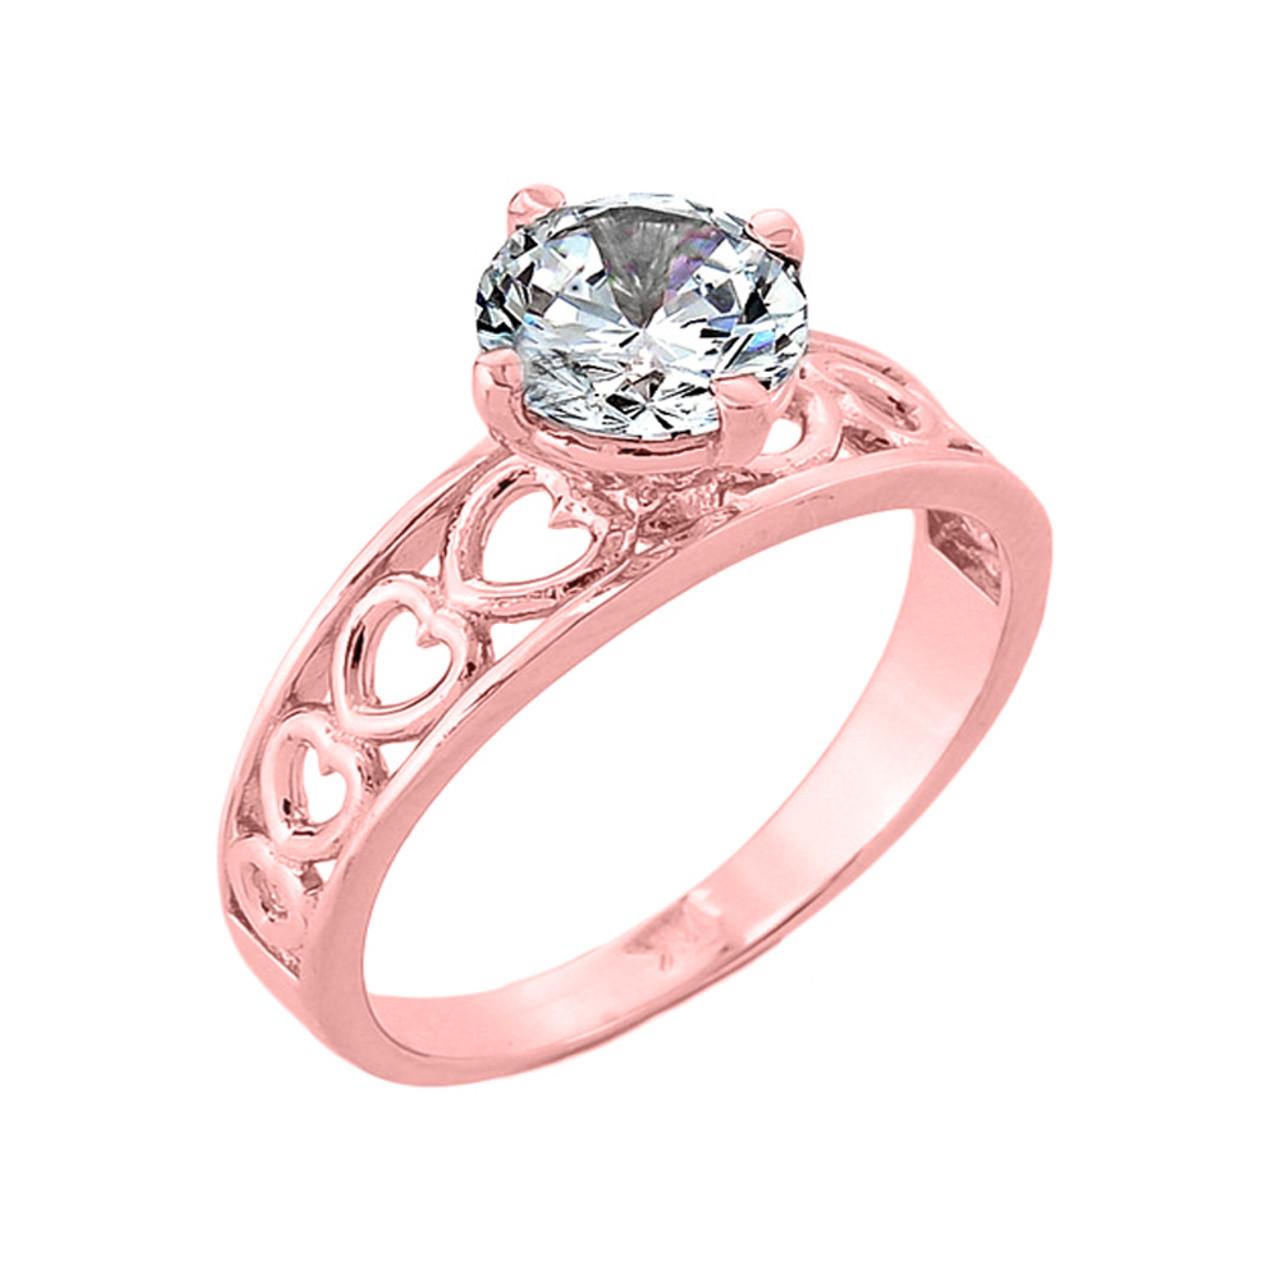 Engagement Ring Cz Engagement Ring White Gold Cz Engagement Ring Rose Gold Cz Solitaire Ring I Cz Solitaire Engagement Ring Round Cz Engagement Ring